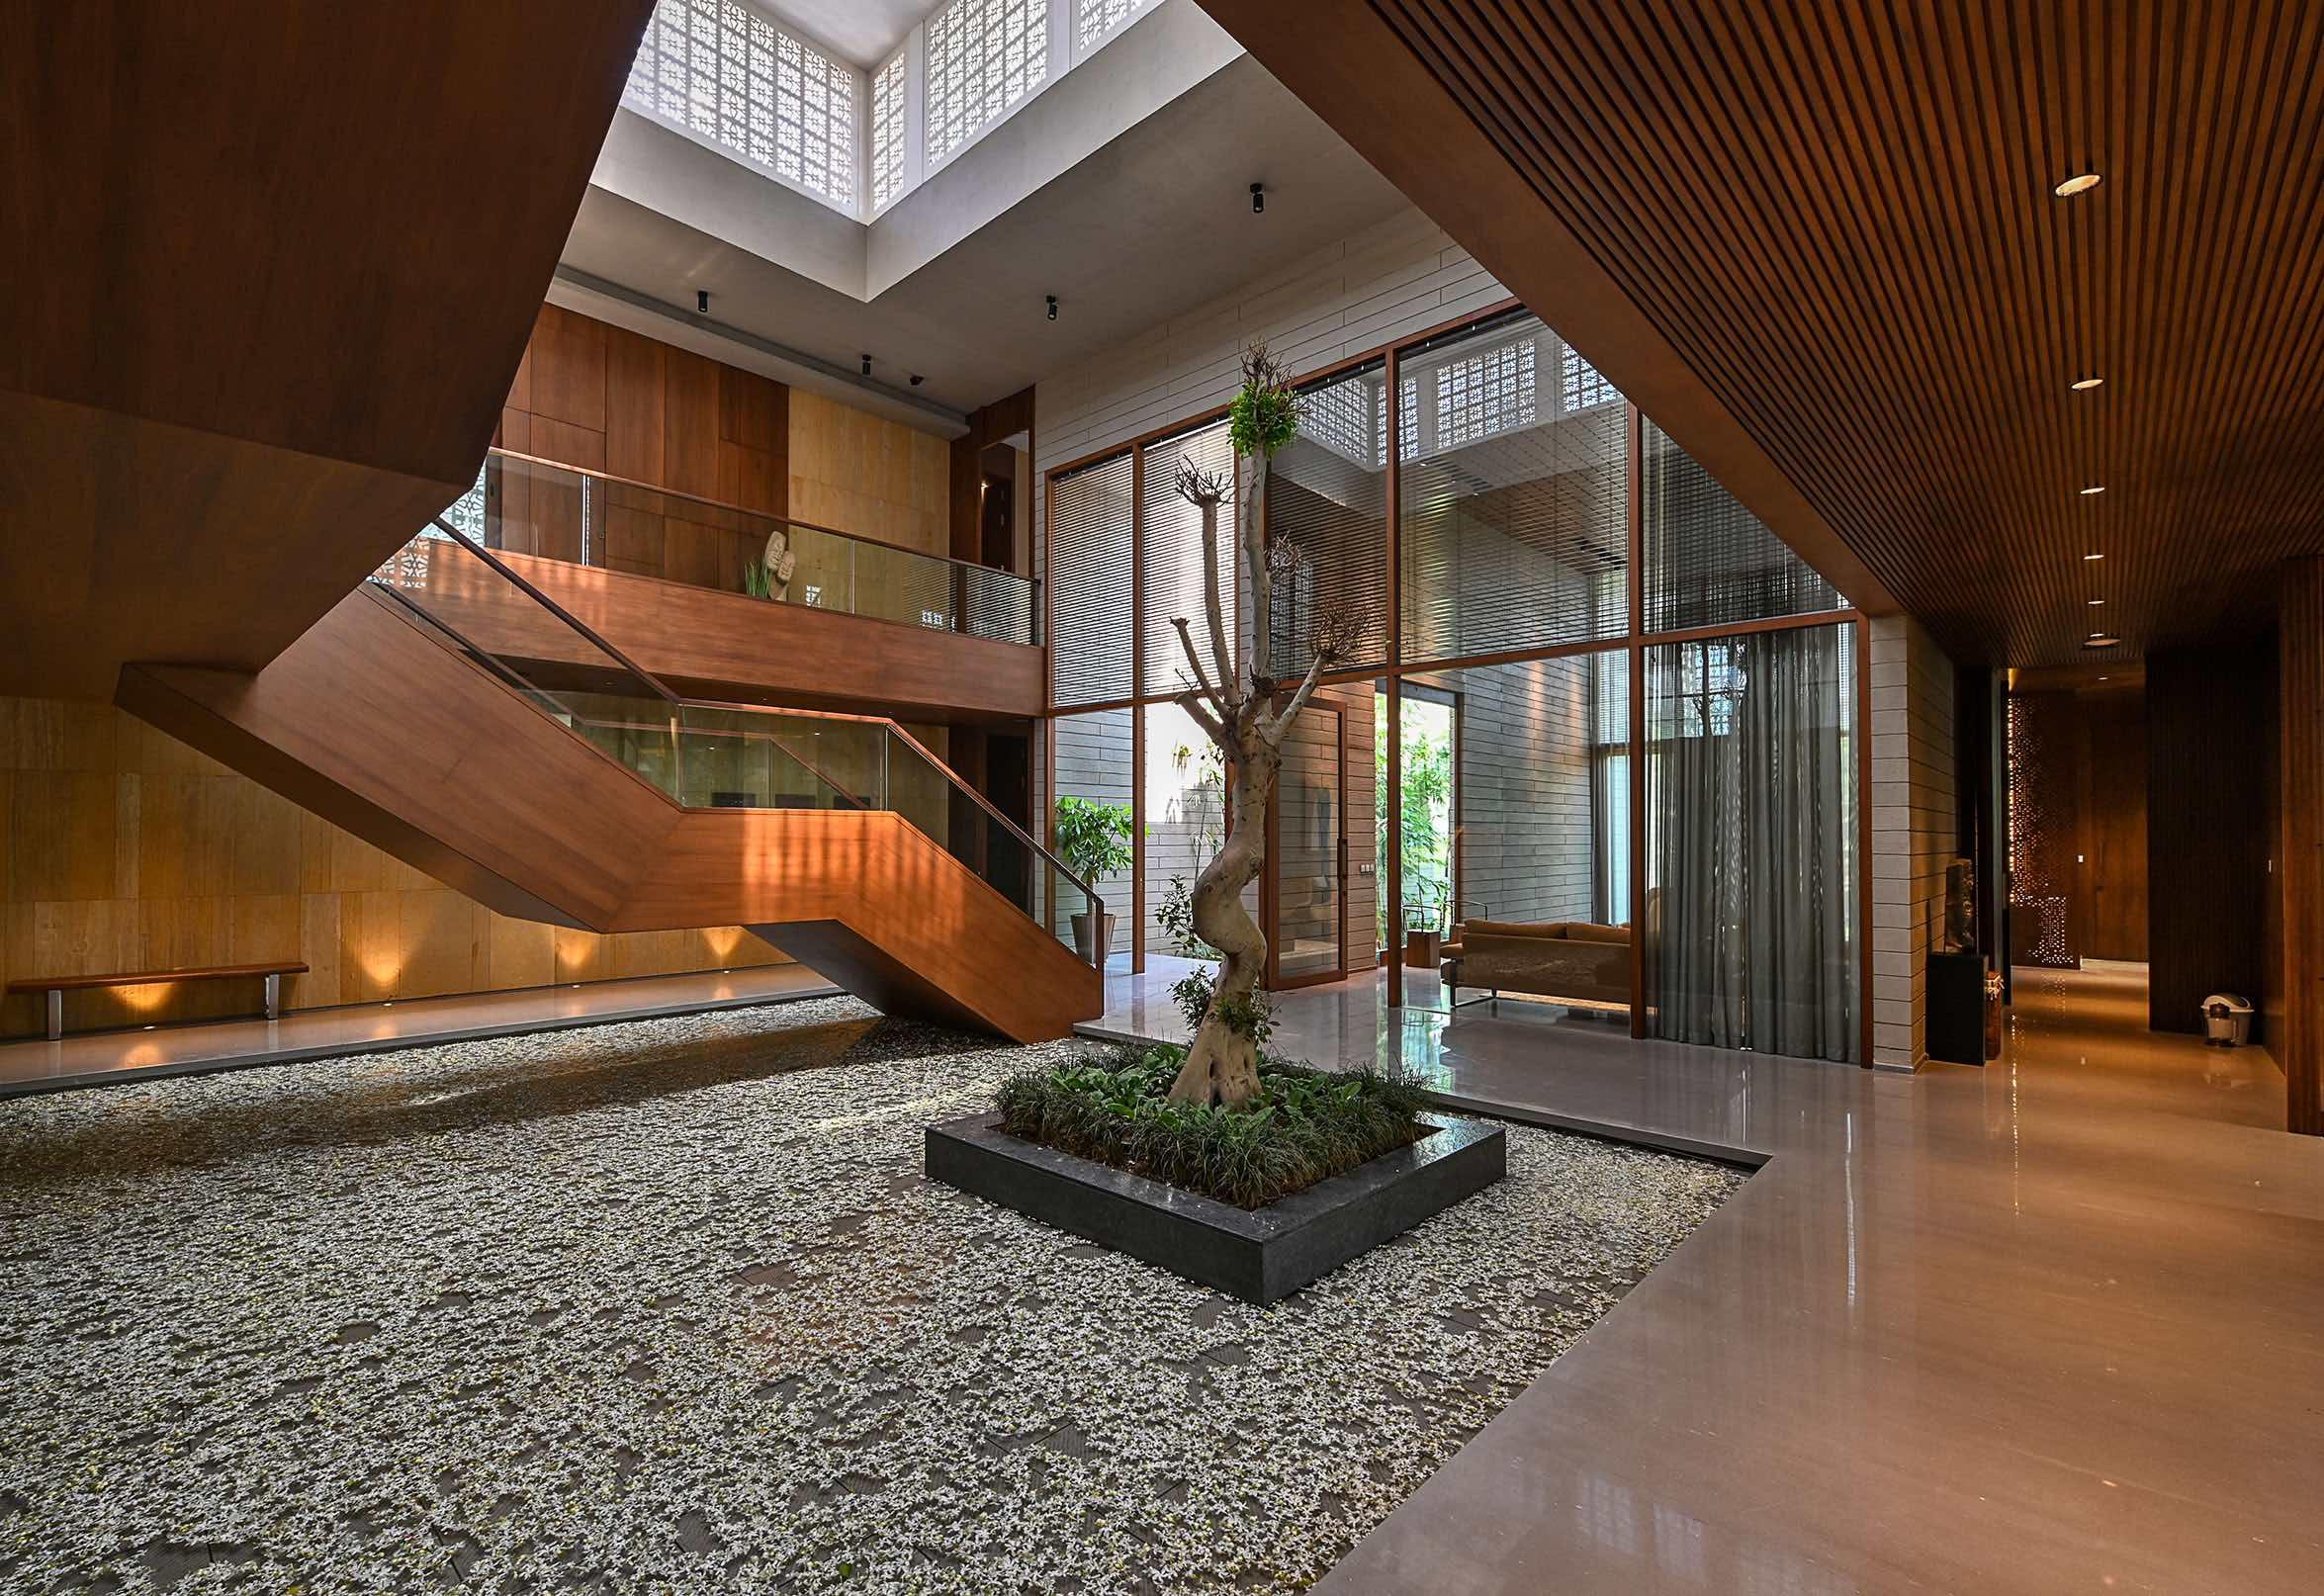 18_Screens_Sanjay_Puri_architects_india_amazingarchitecture_008.jpg